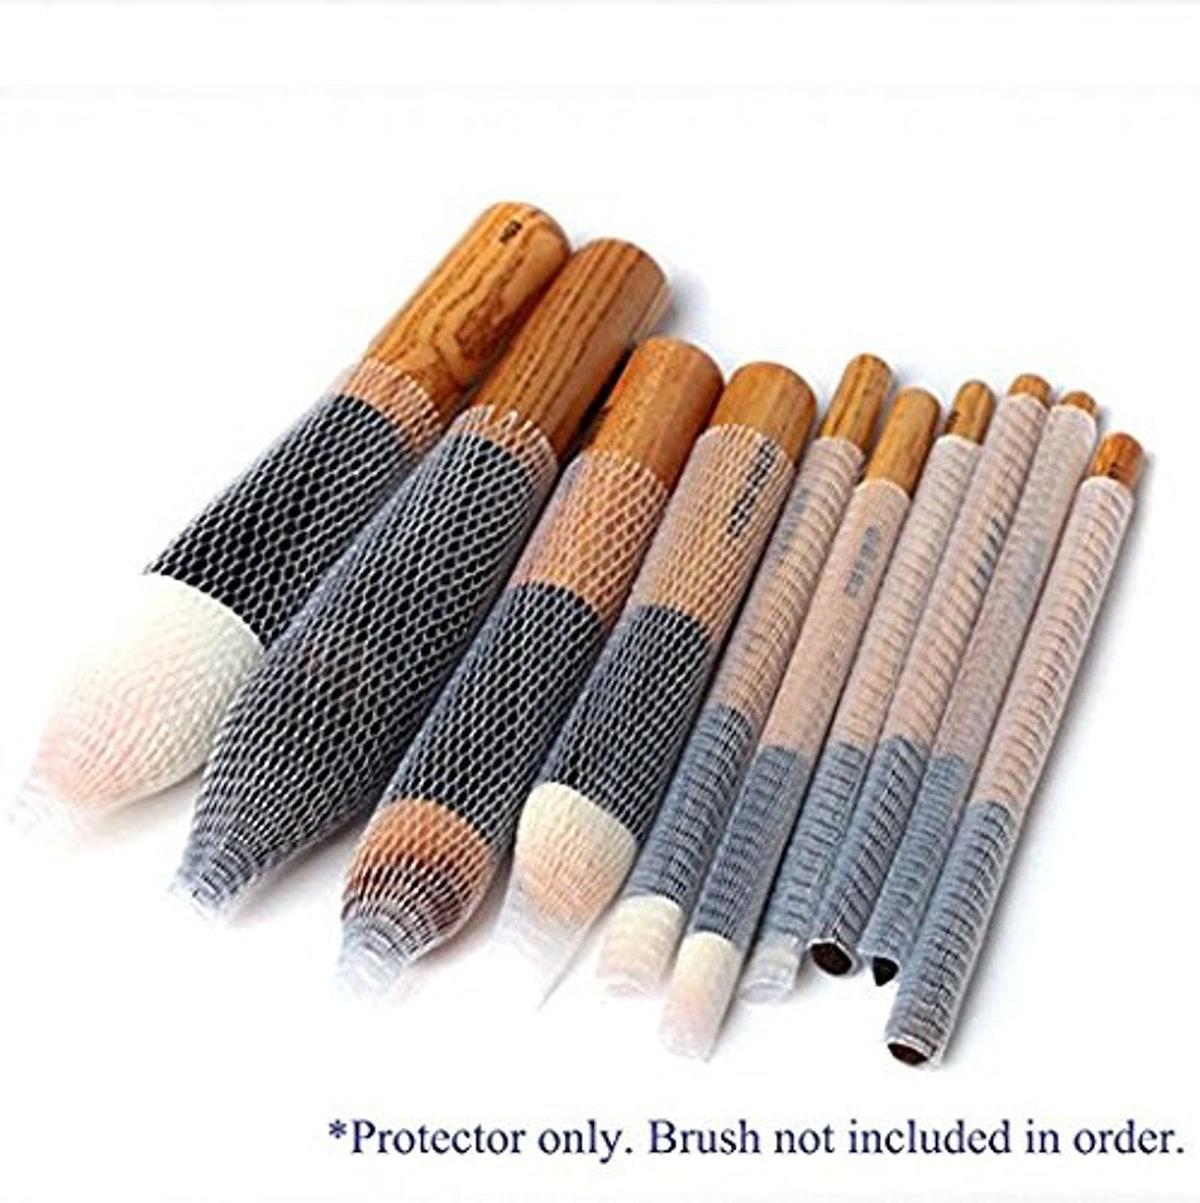 Magik Protect Pro Makeup Brush Protector (150-Pack)